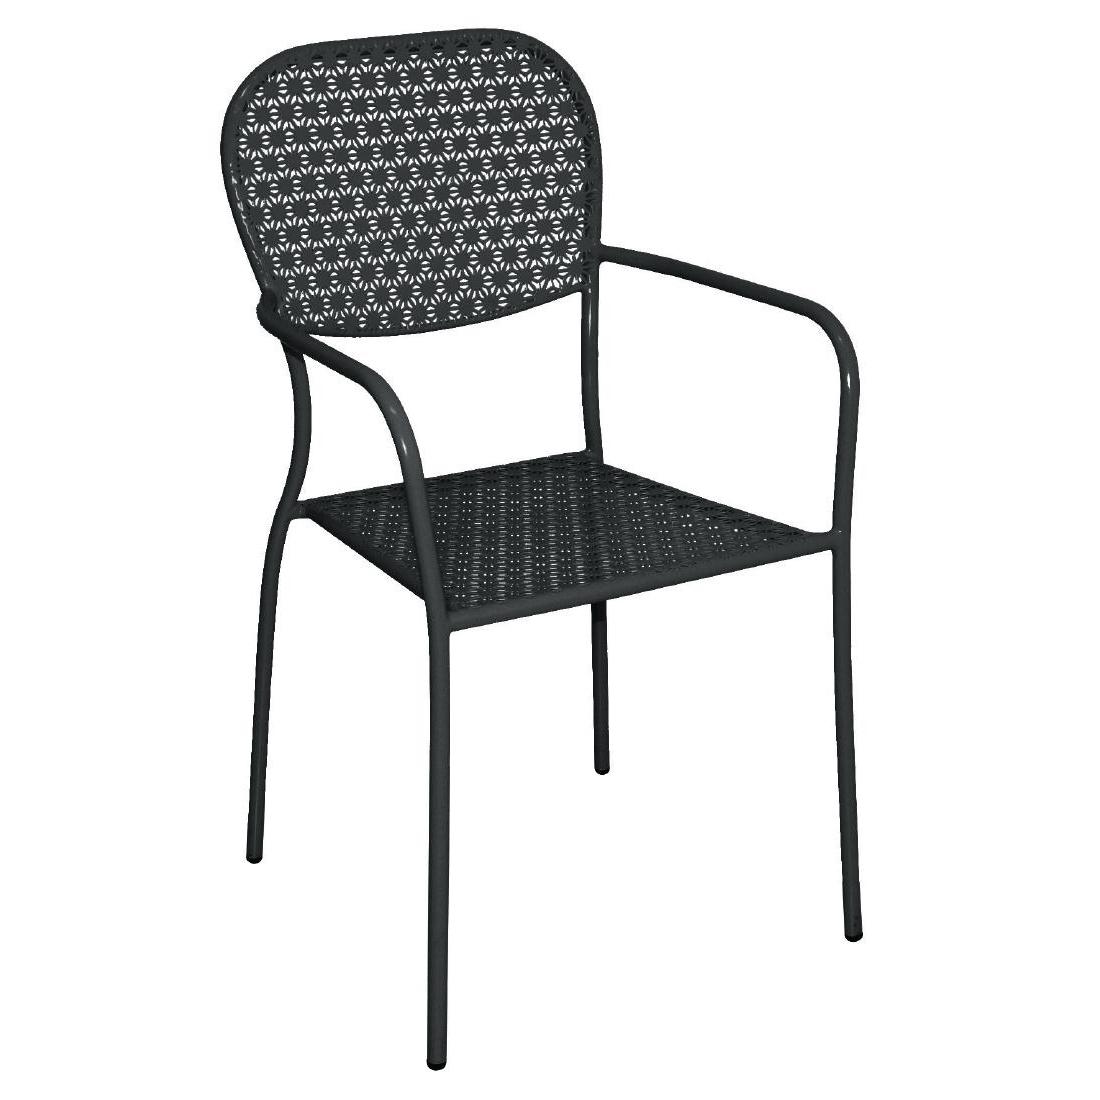 outdoor stuhl krista 150st a schwarz g nstig kaufen m bel star. Black Bedroom Furniture Sets. Home Design Ideas